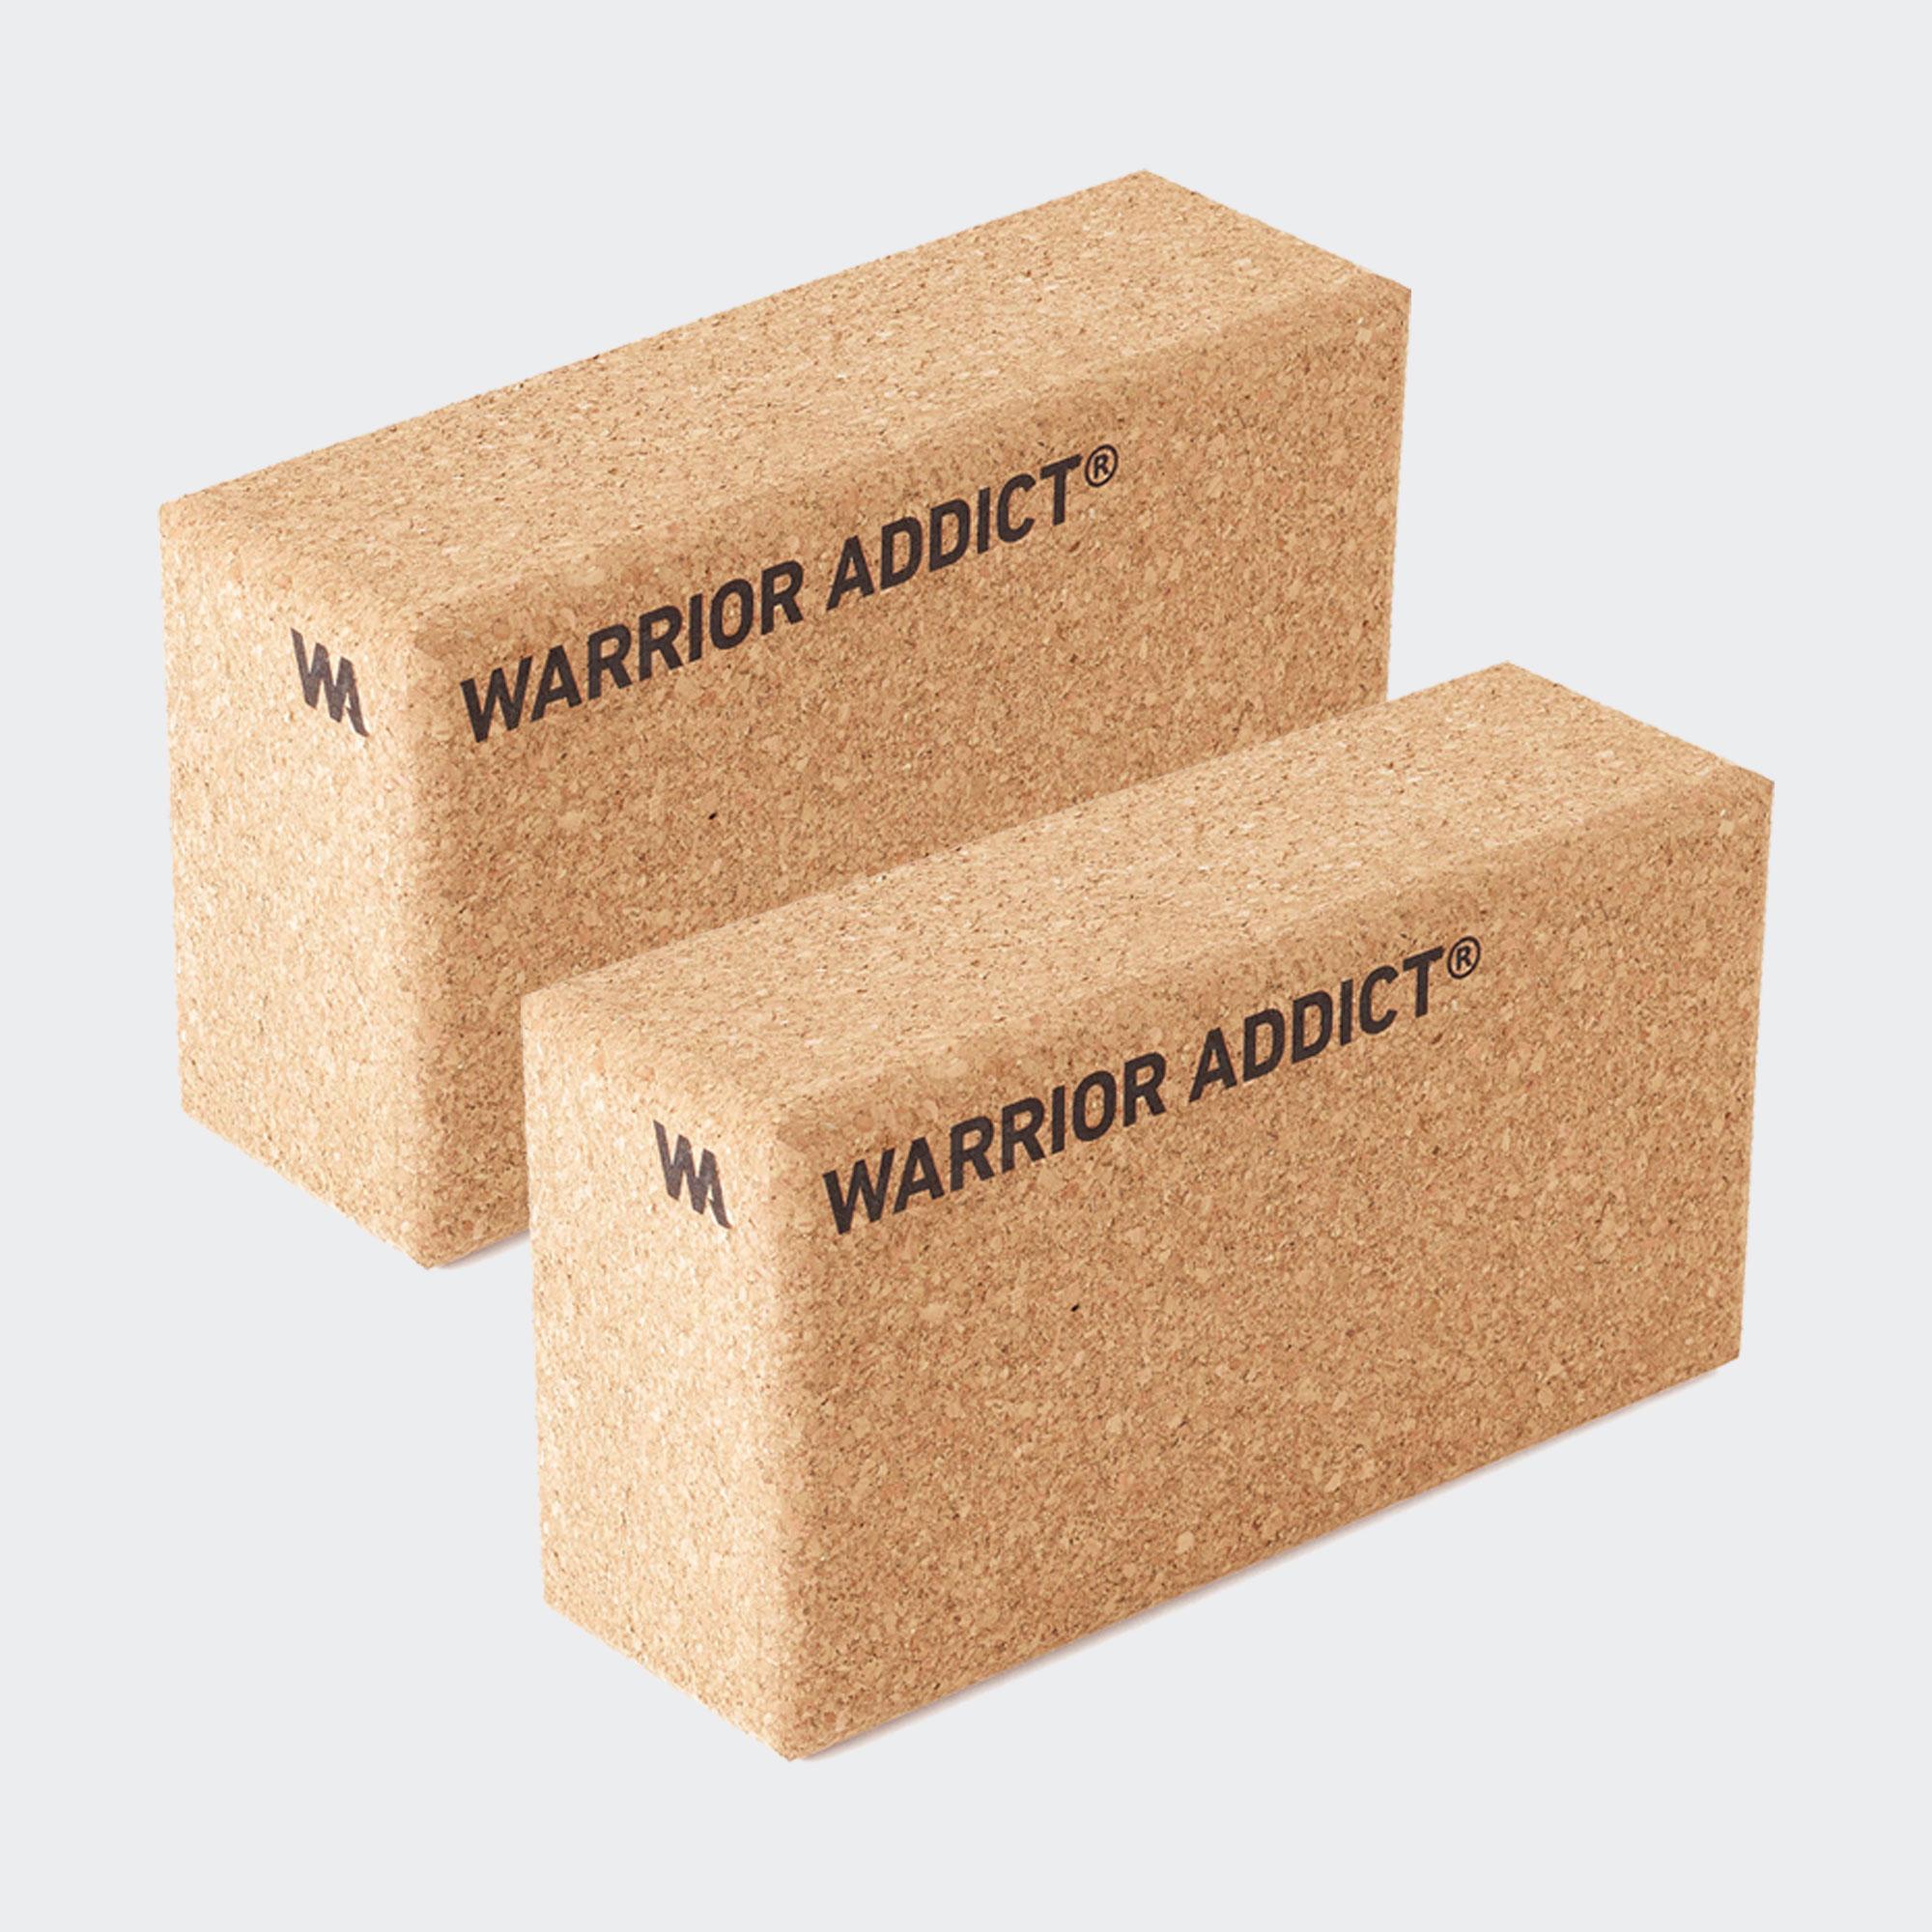 warrior addict set of two cork yoga blocks side view